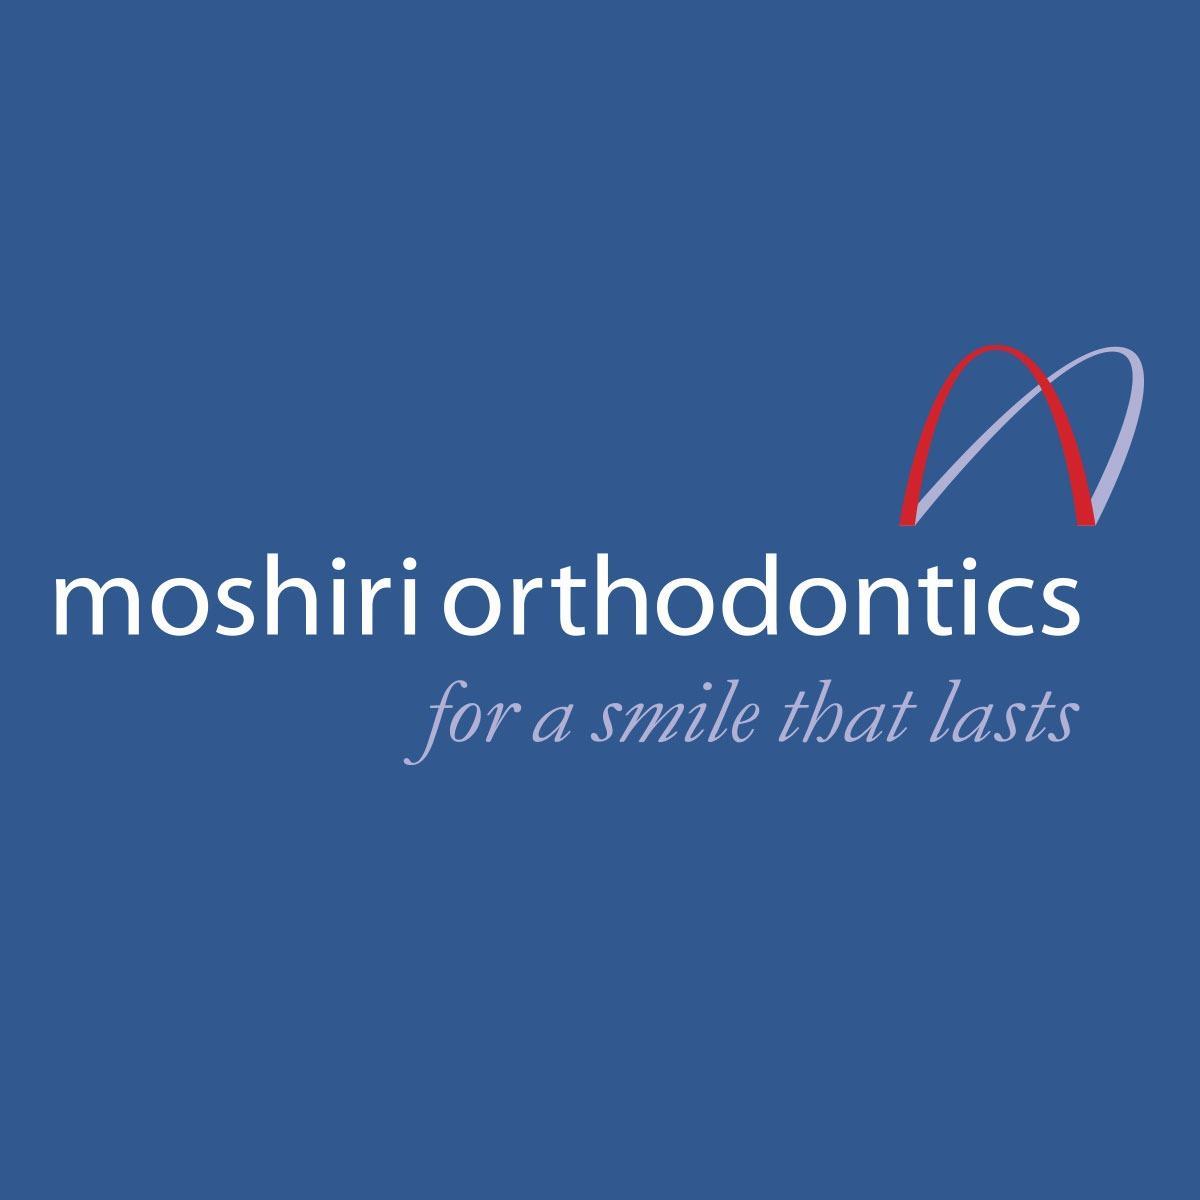 Moshiri Orthodontics image 3